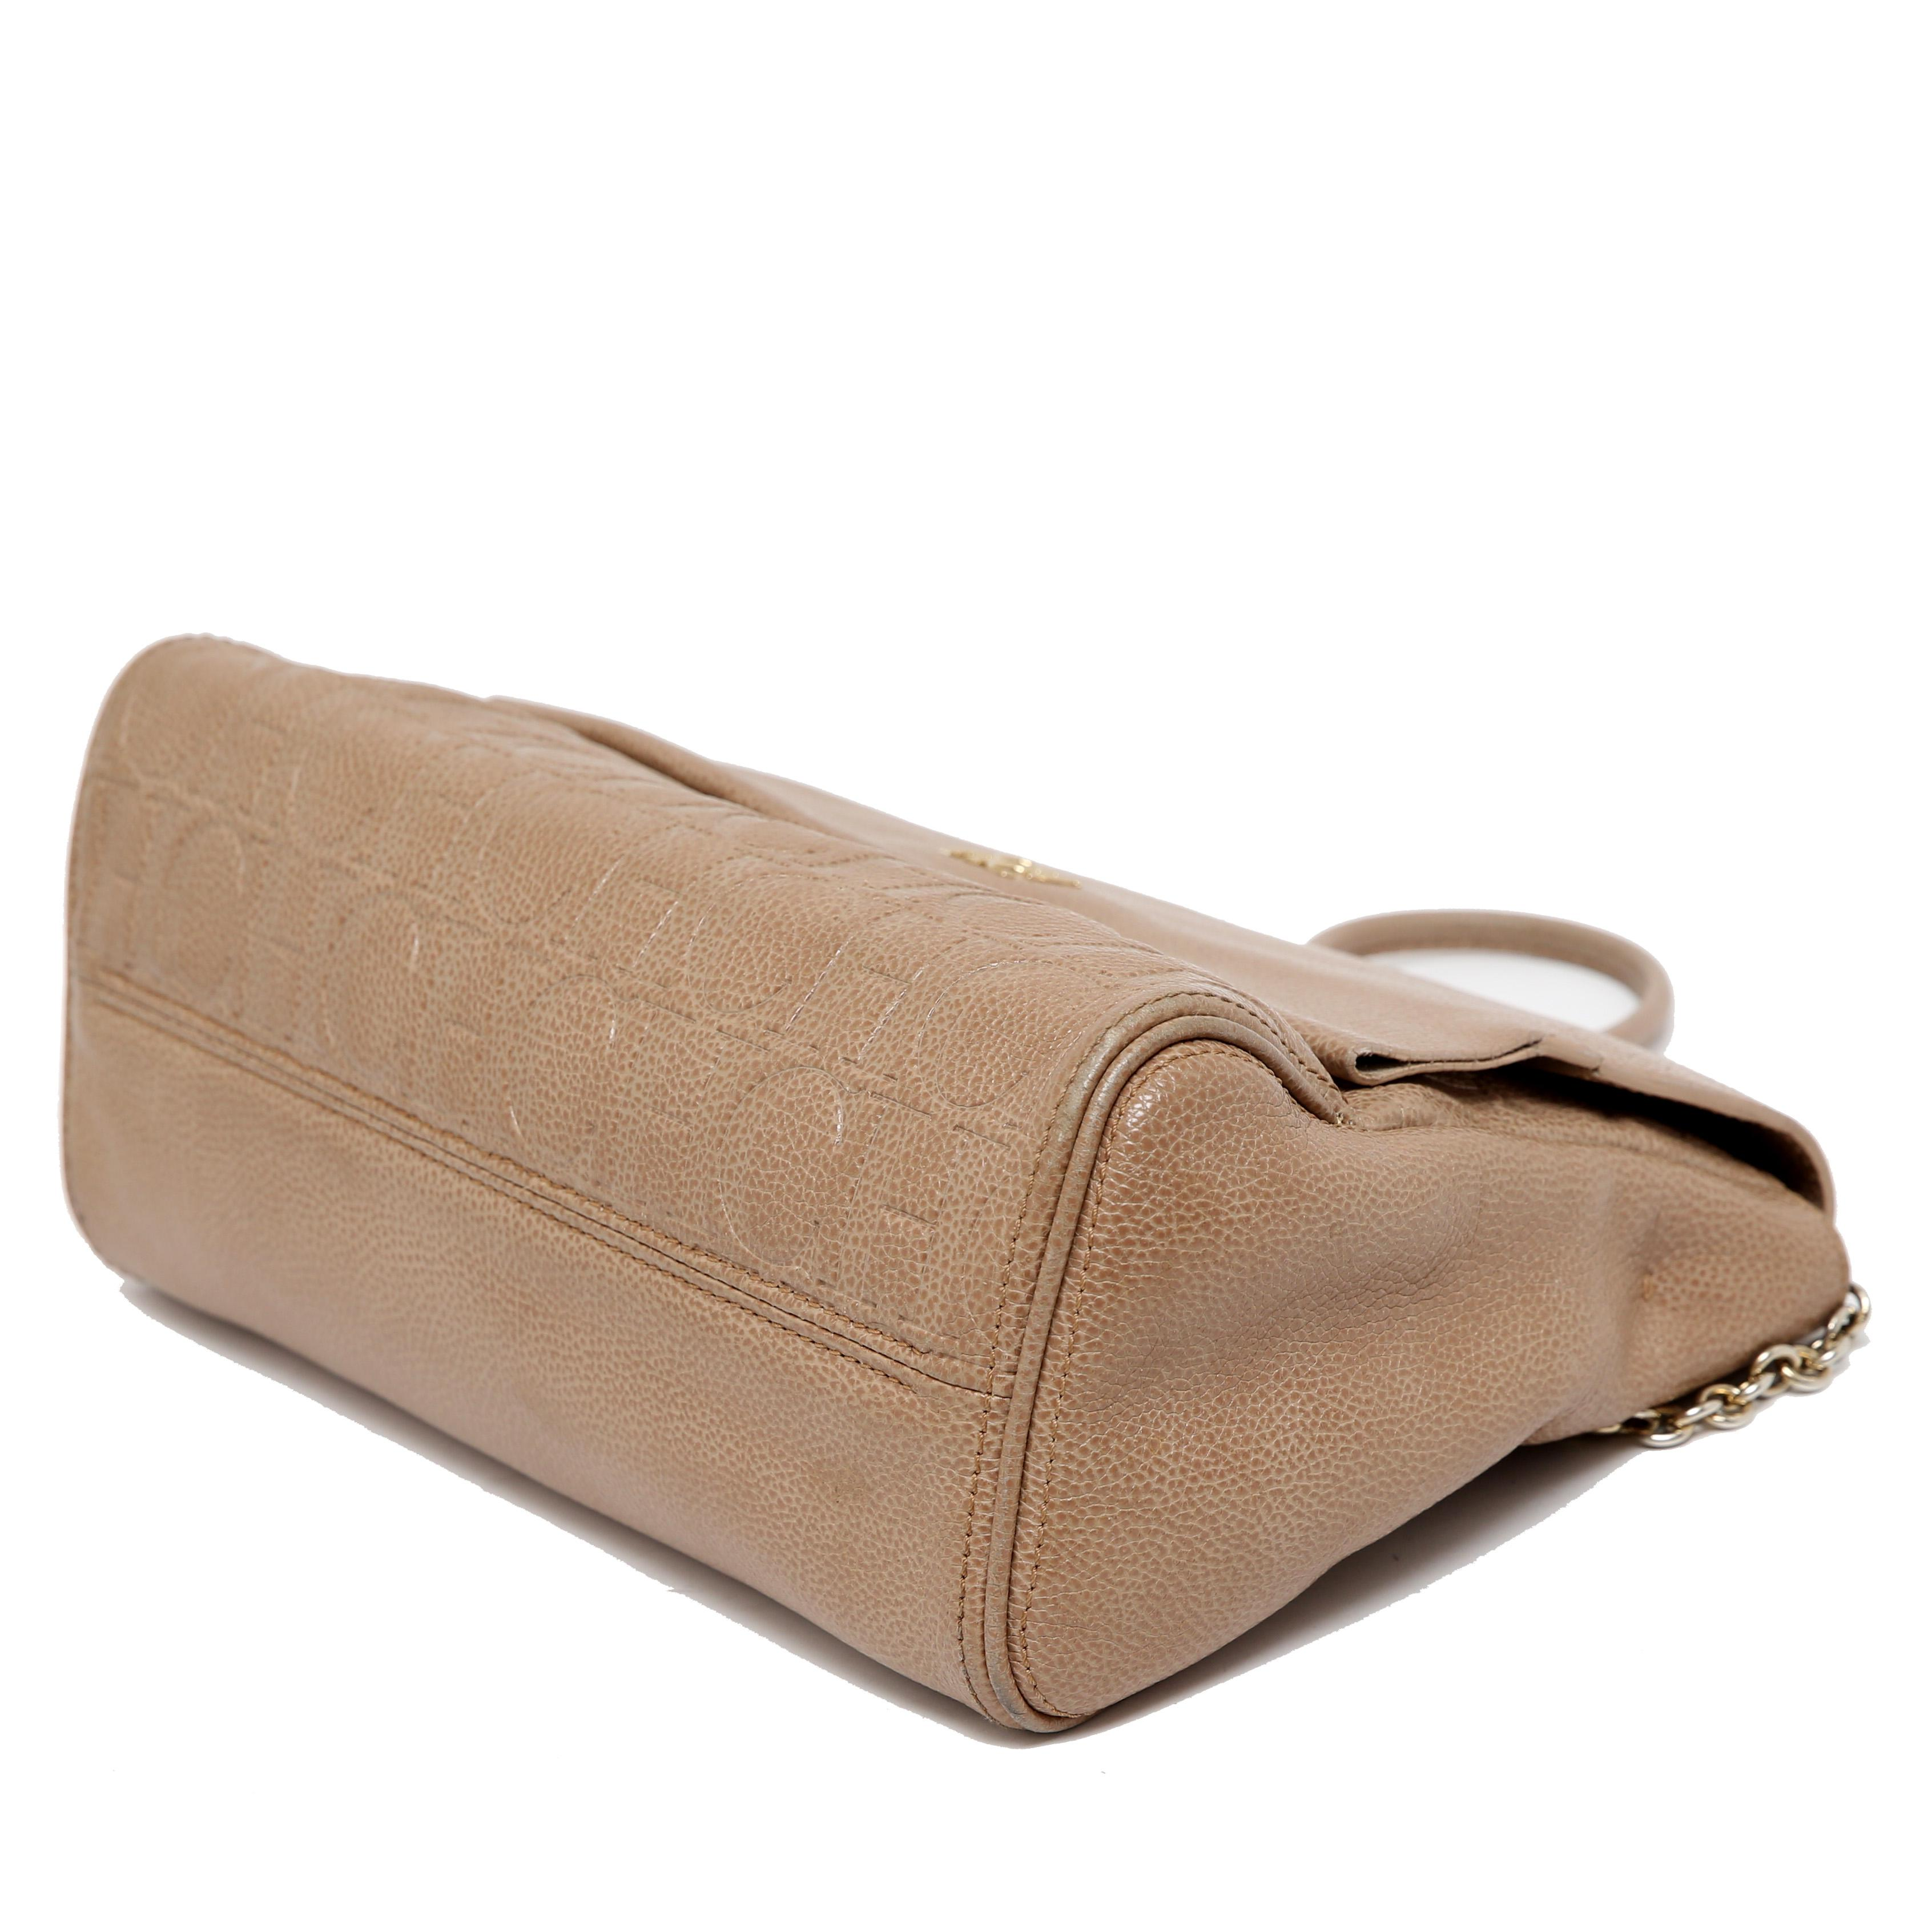 Lyst - Carolina Herrera Leather Minuetto Flap Bag in Natural a85a79d380f65